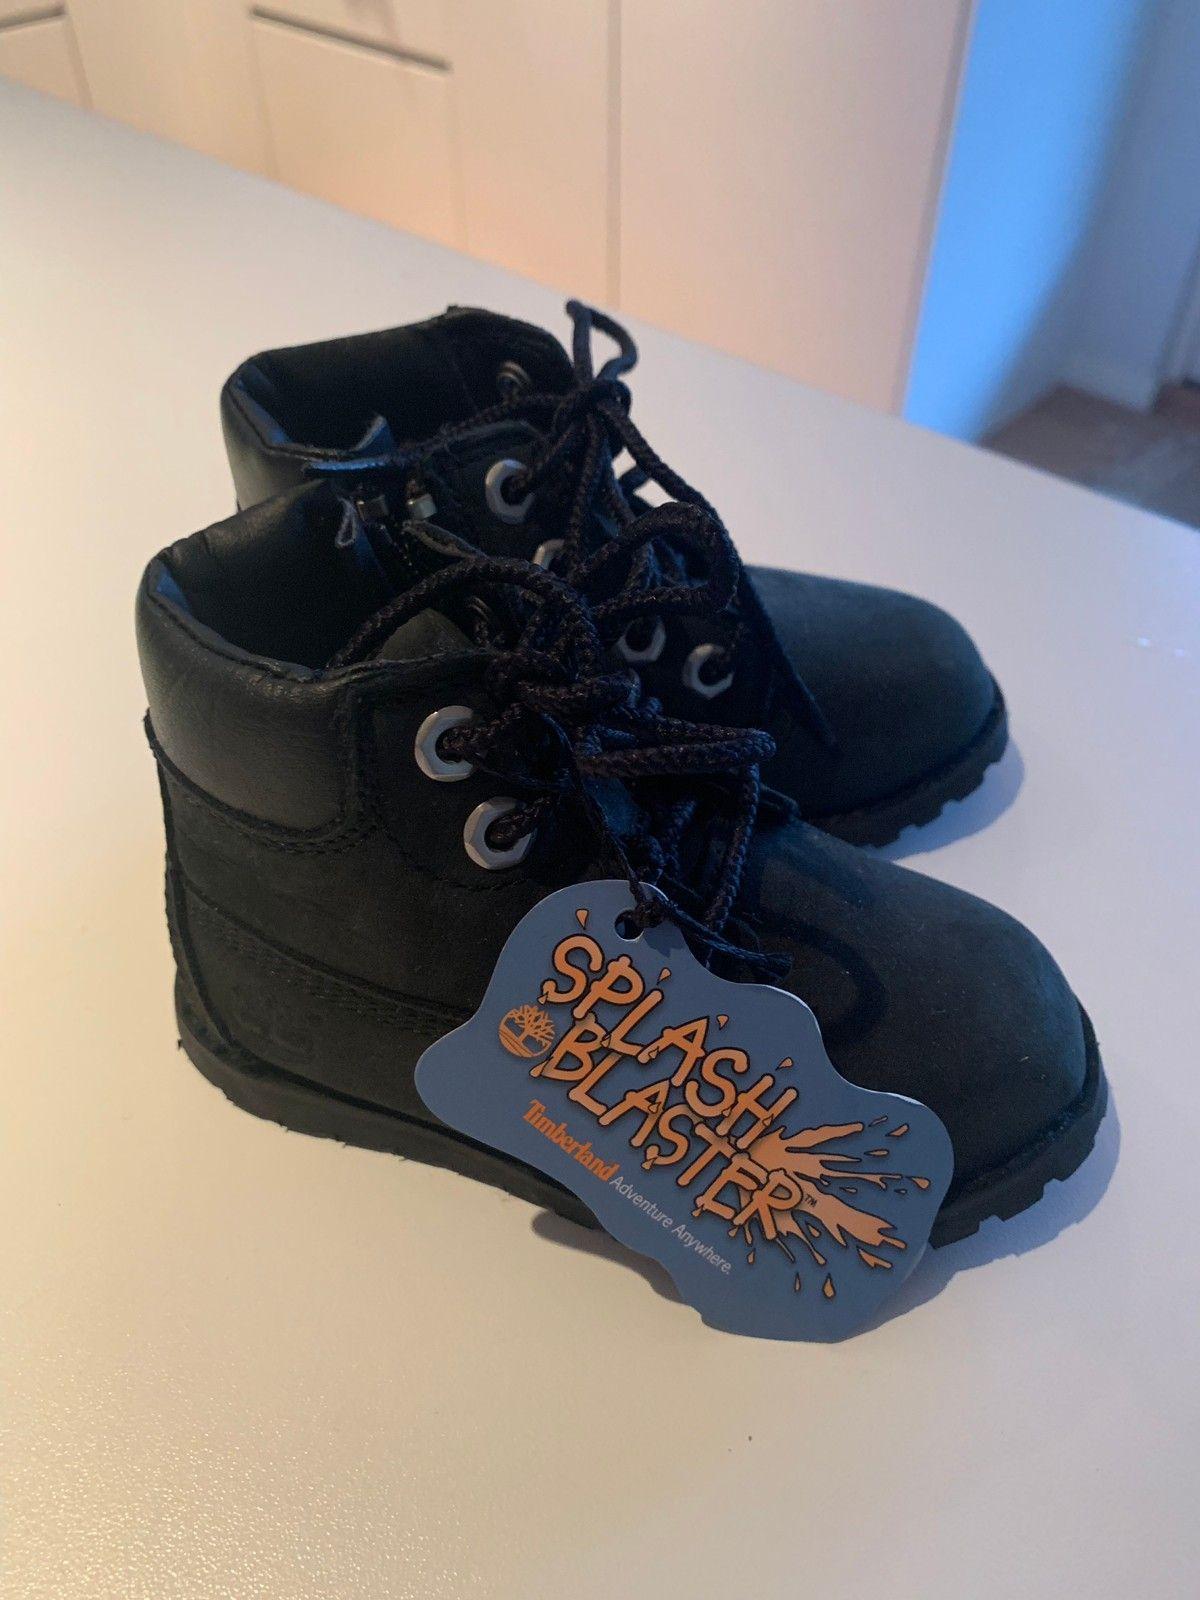 Ubrukte Timberland sko i str 22 | FINN.no